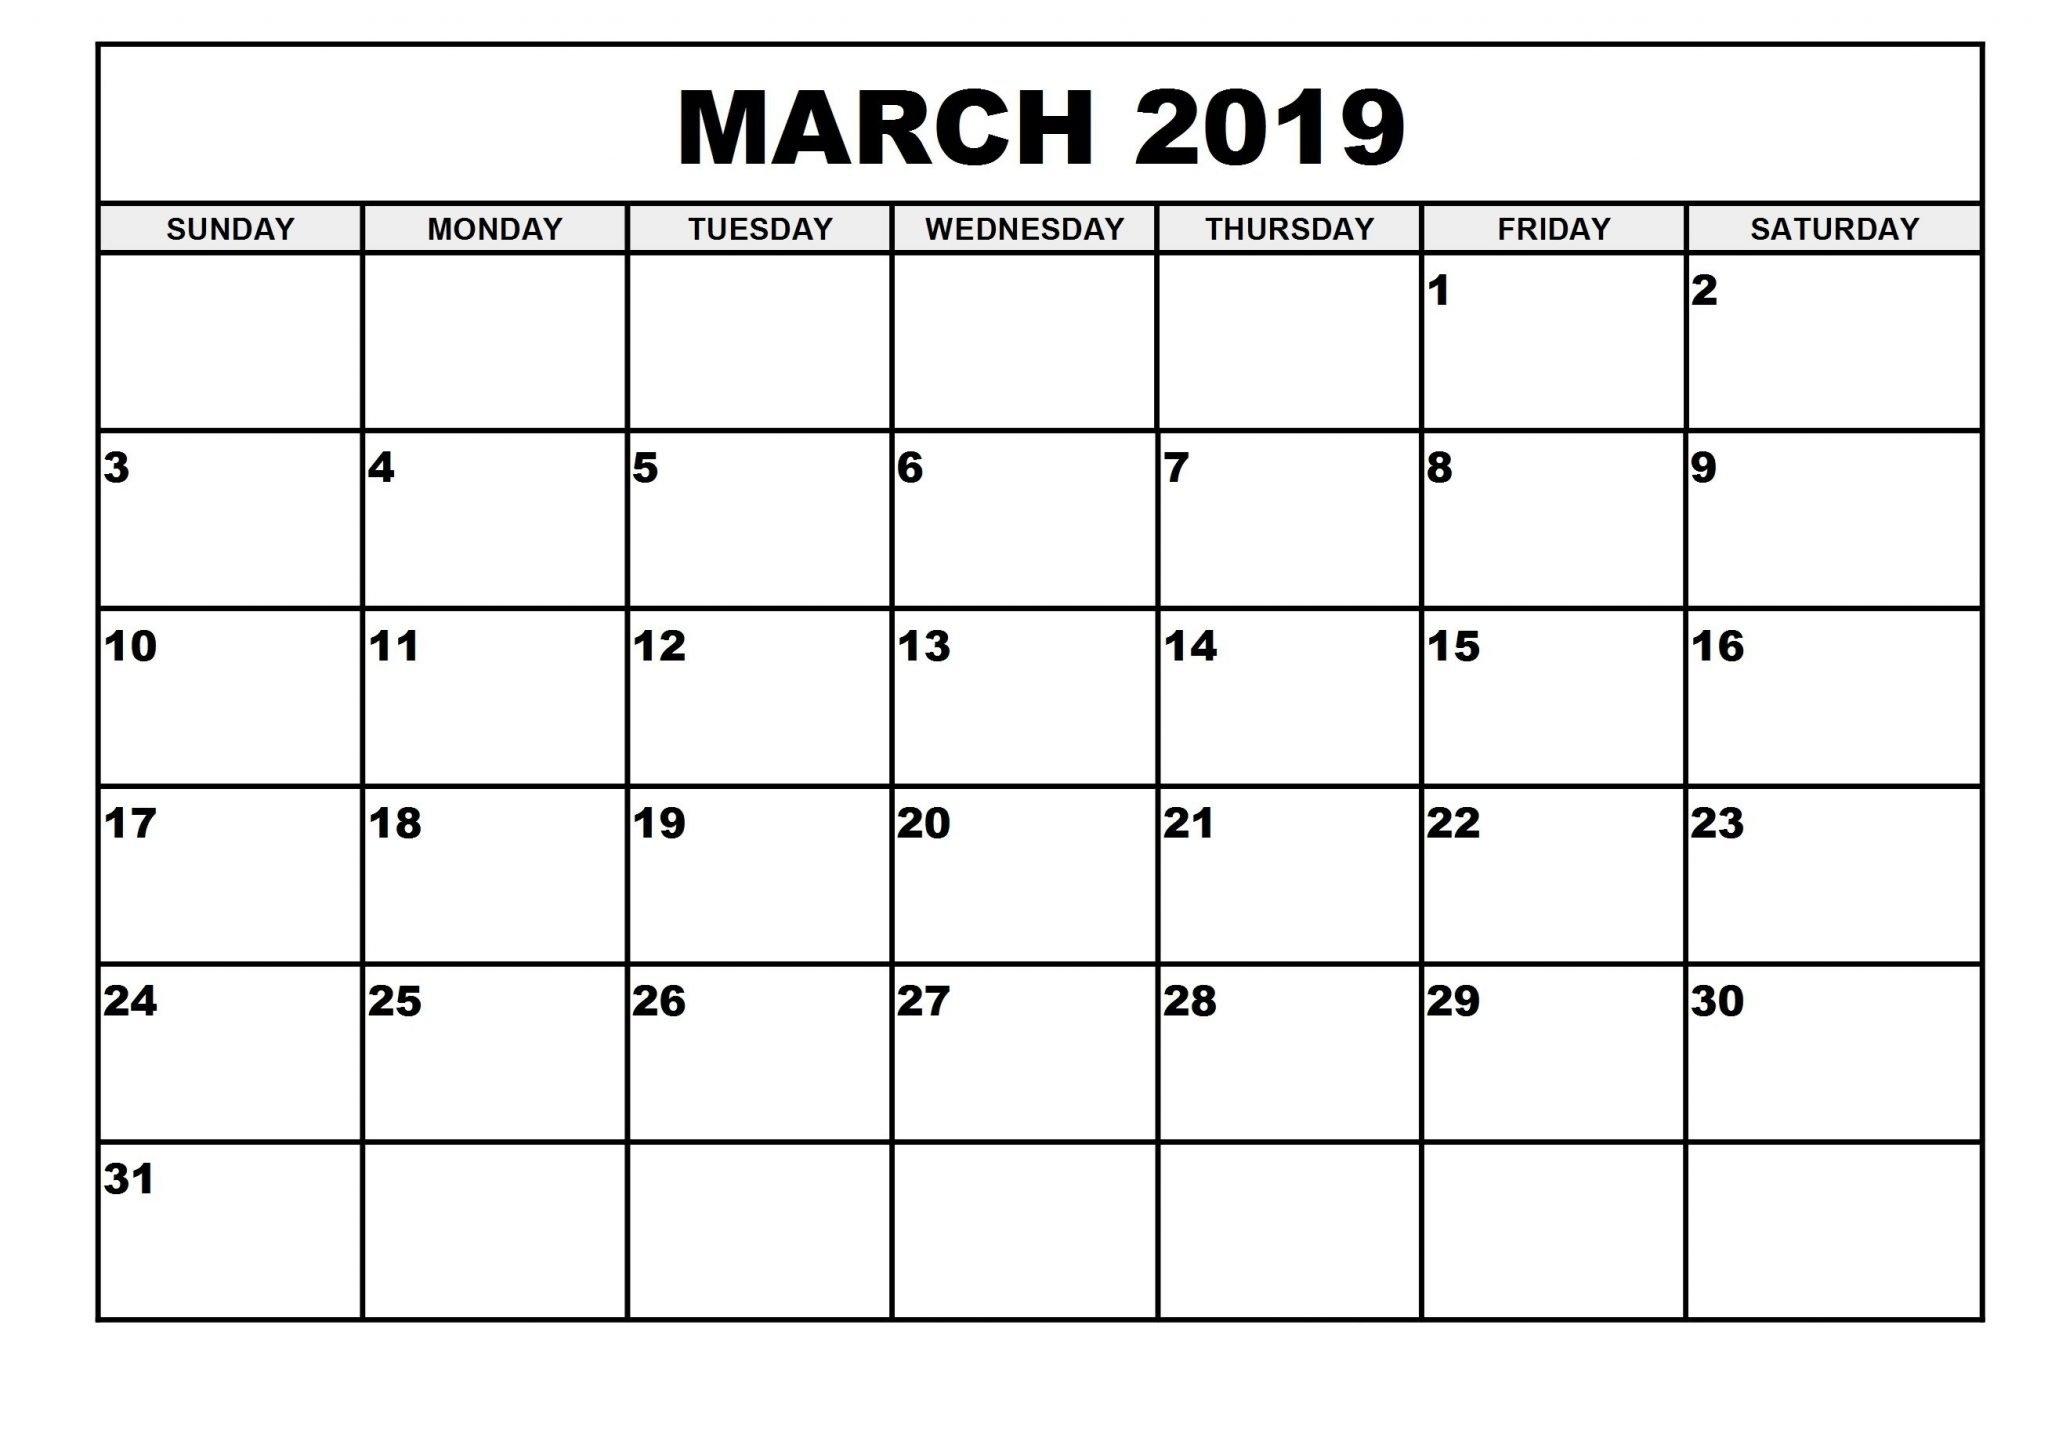 2019 Monthly Printable March 2019 Calendar – Printable Calendar 2019 March 1 2019 Calendar